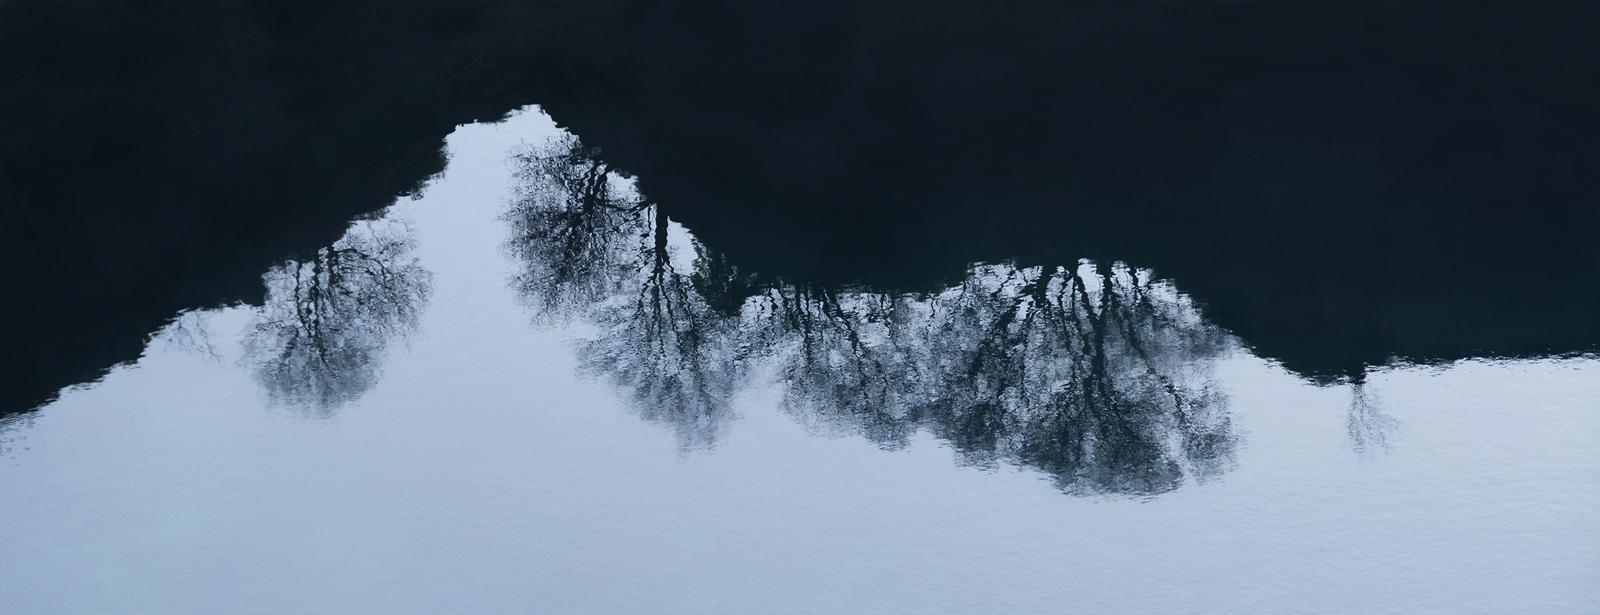 2. tree reflections.sue hogarth